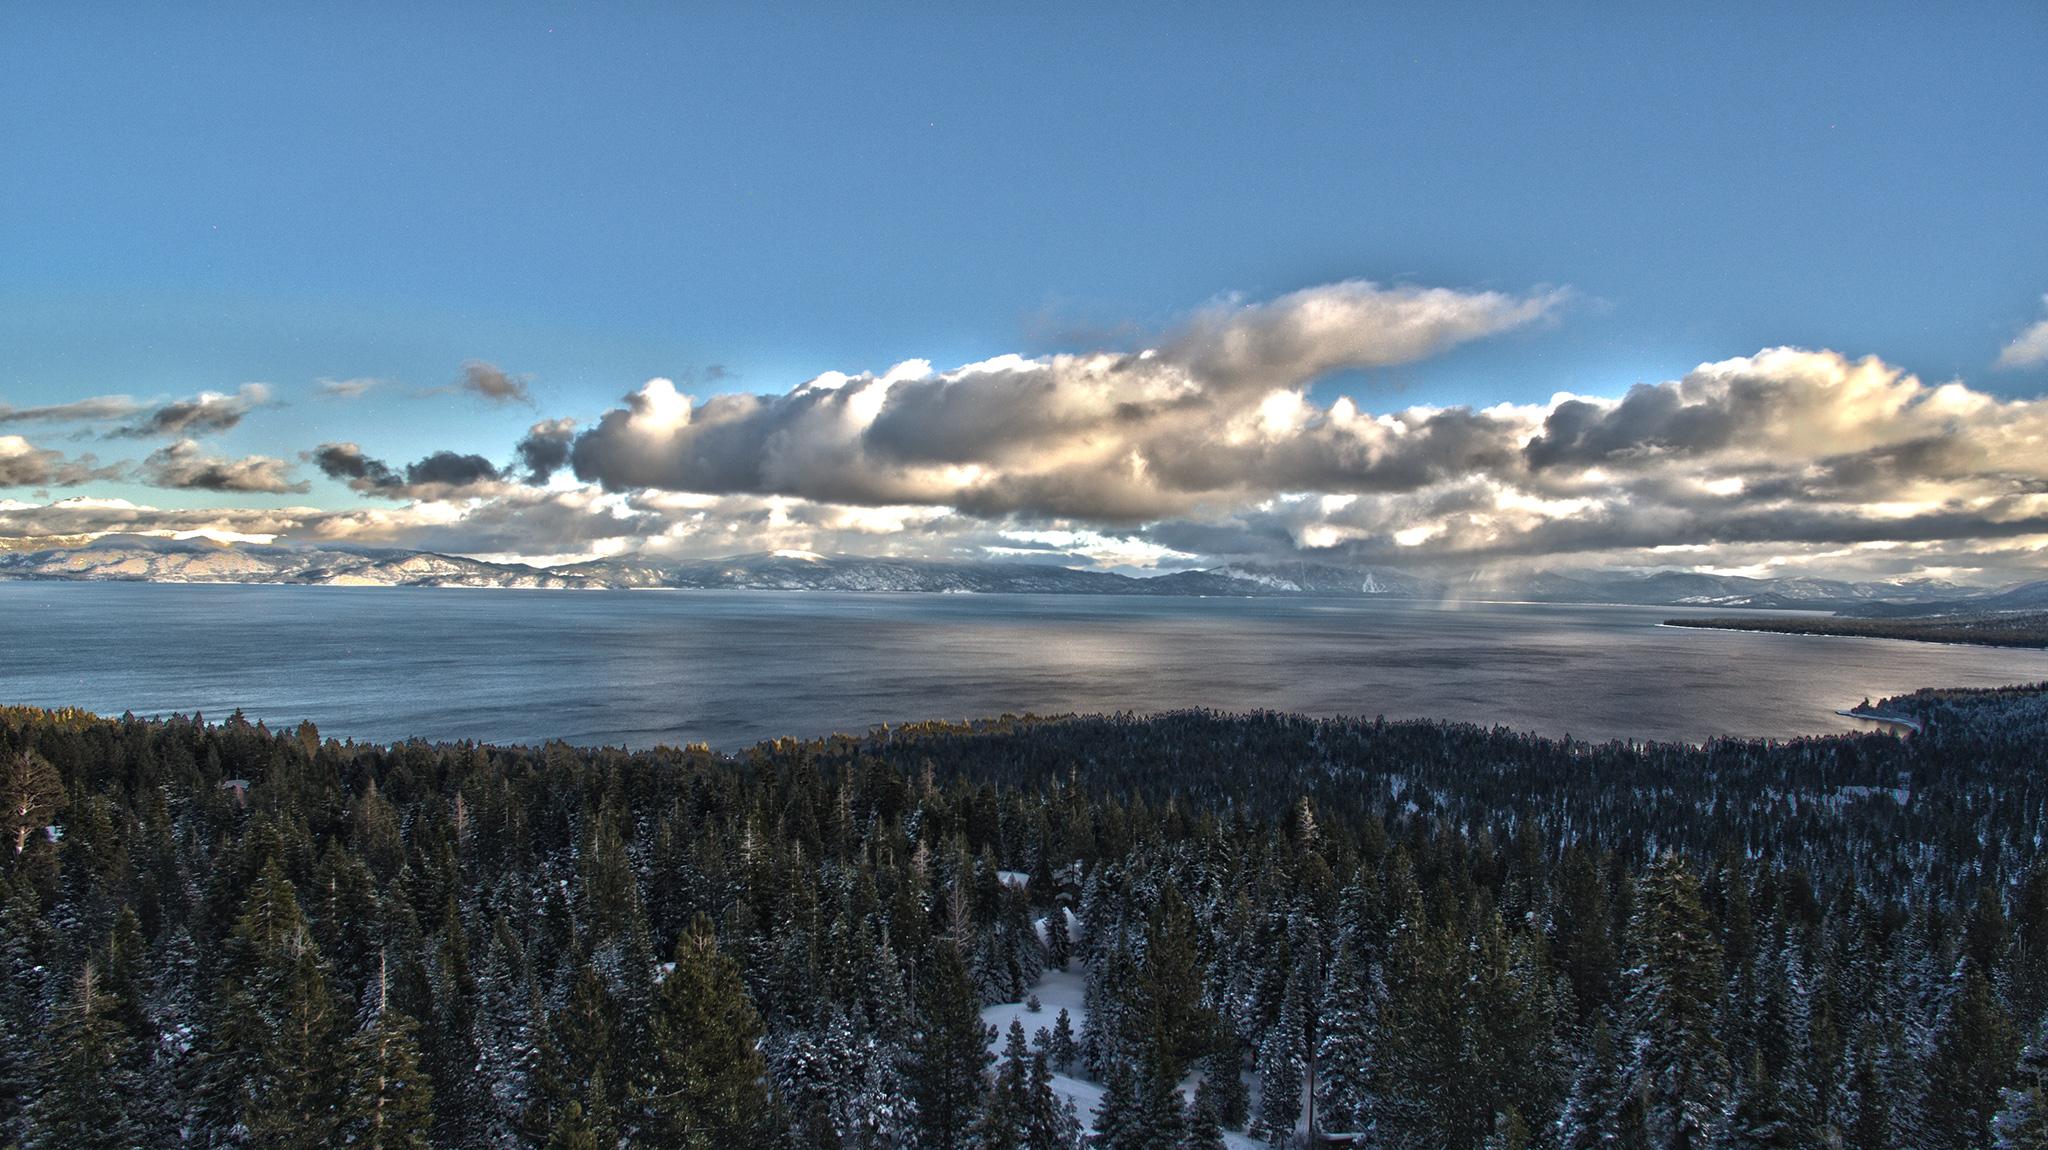 LakeTahoe-HDR.jpg